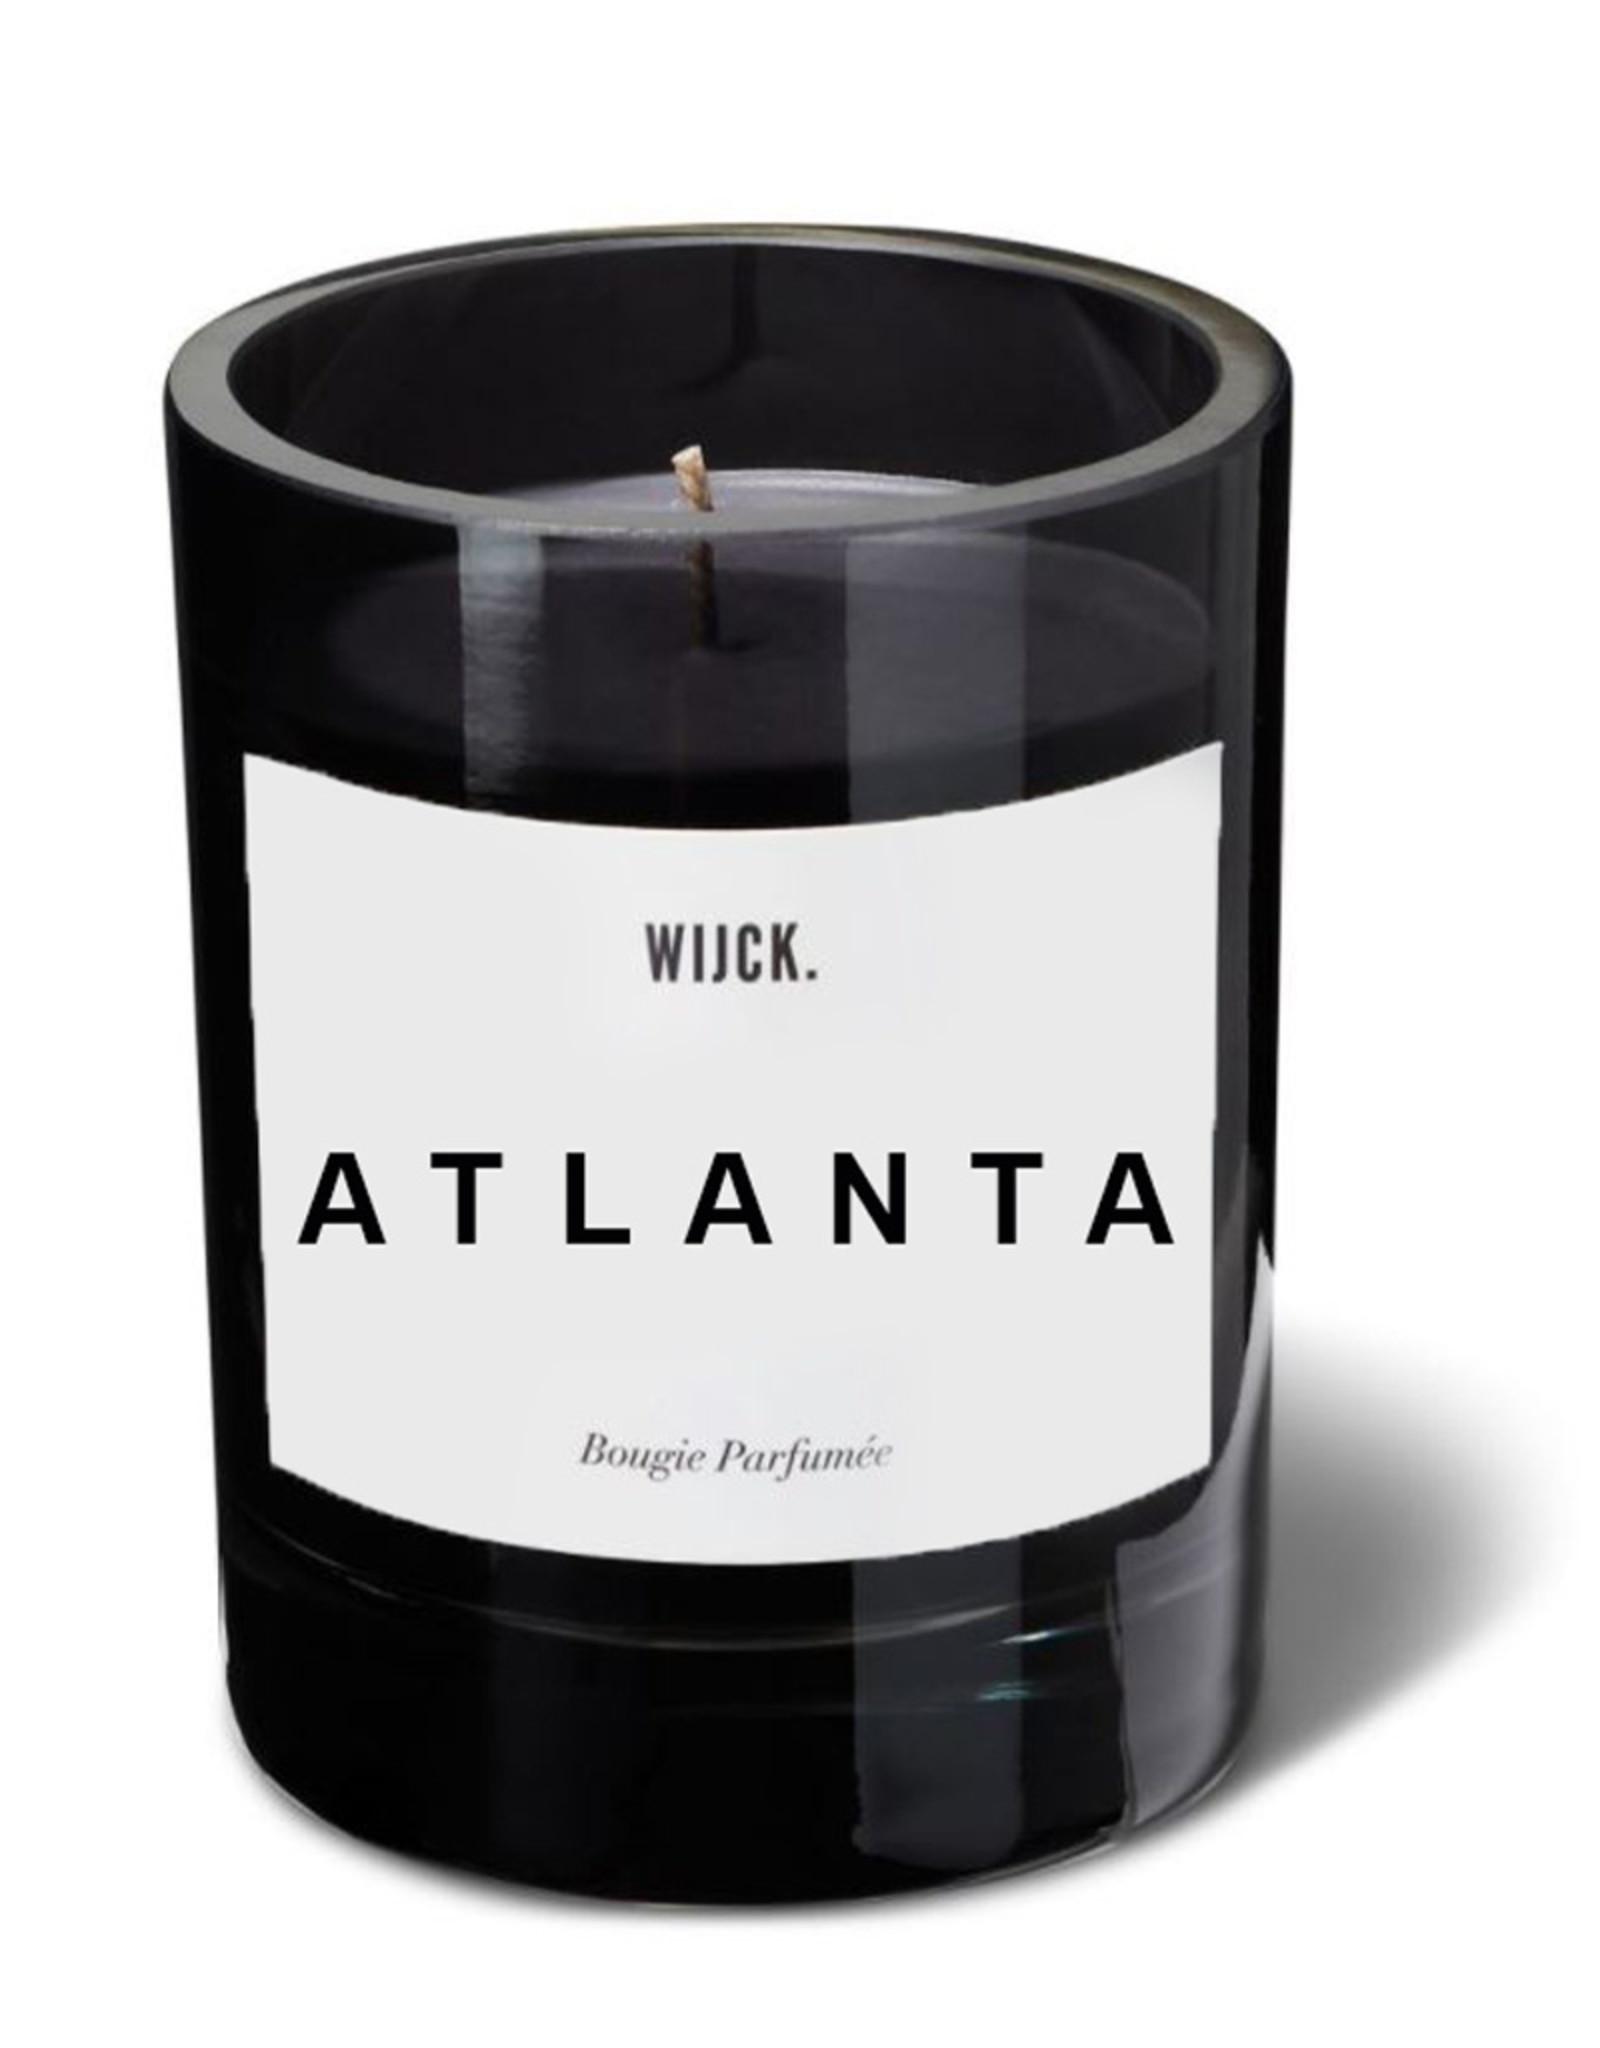 Wijck Atlanta Candle